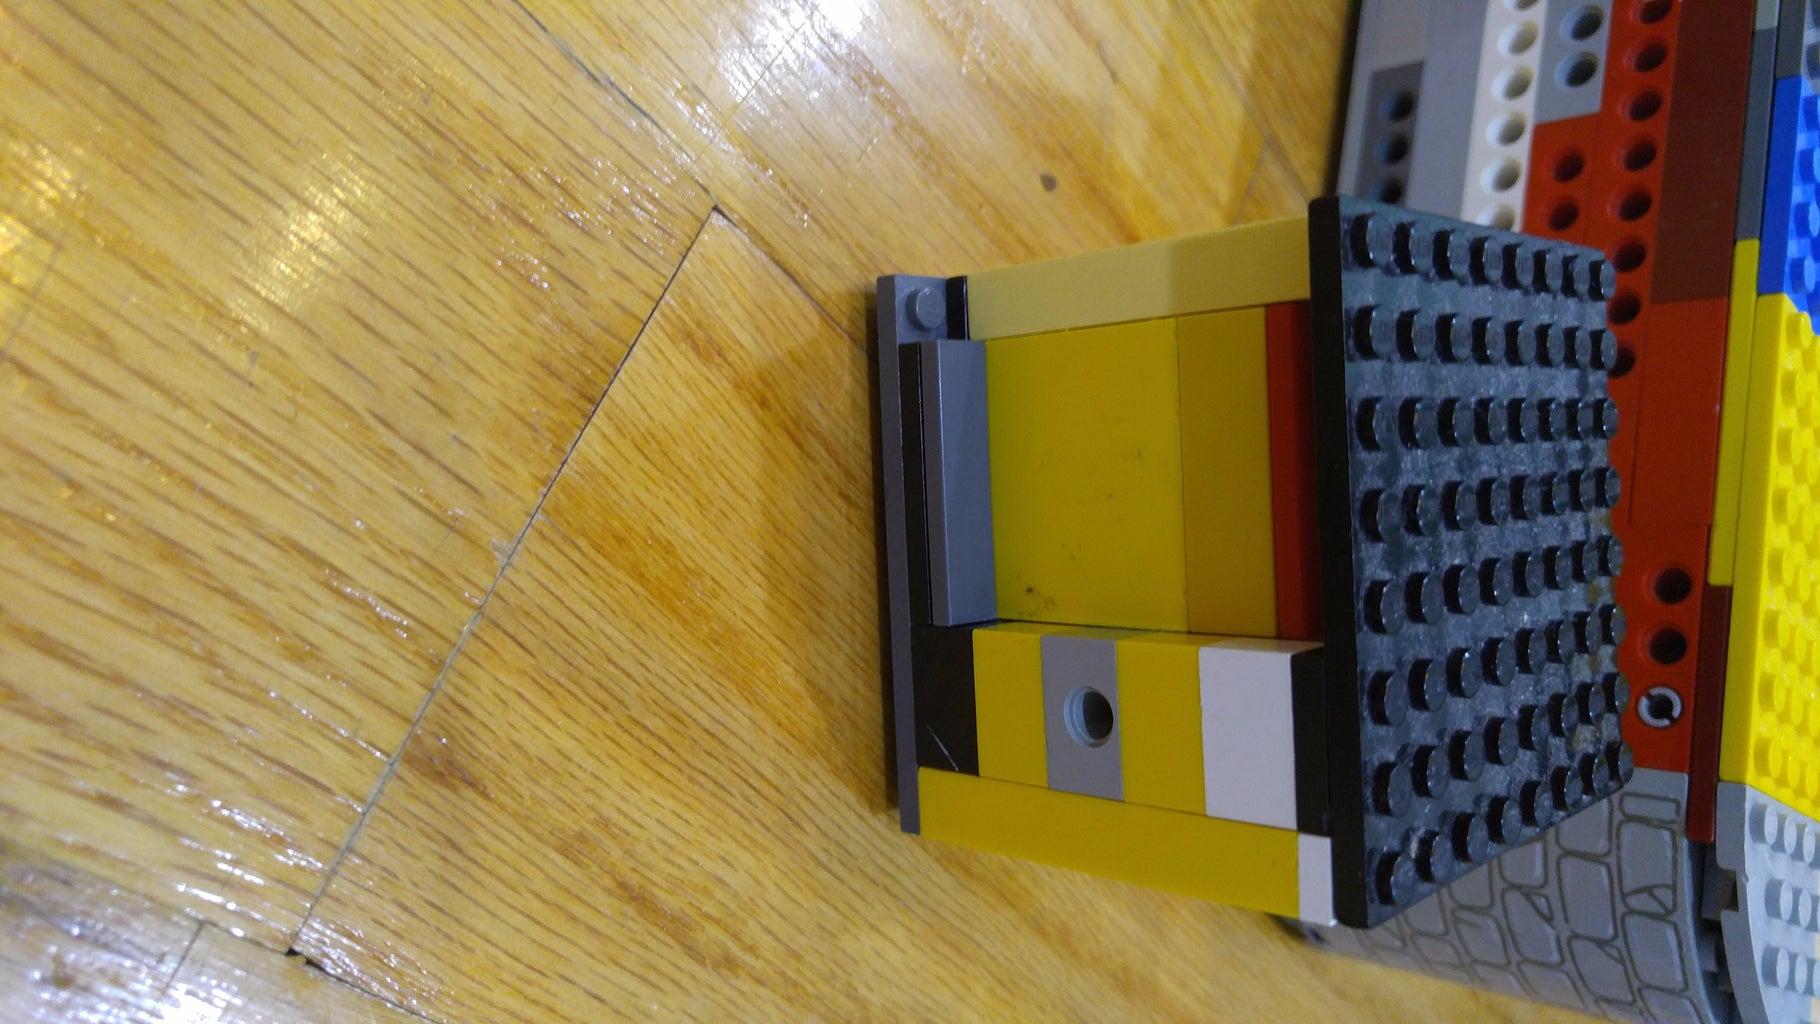 The Lego Safe